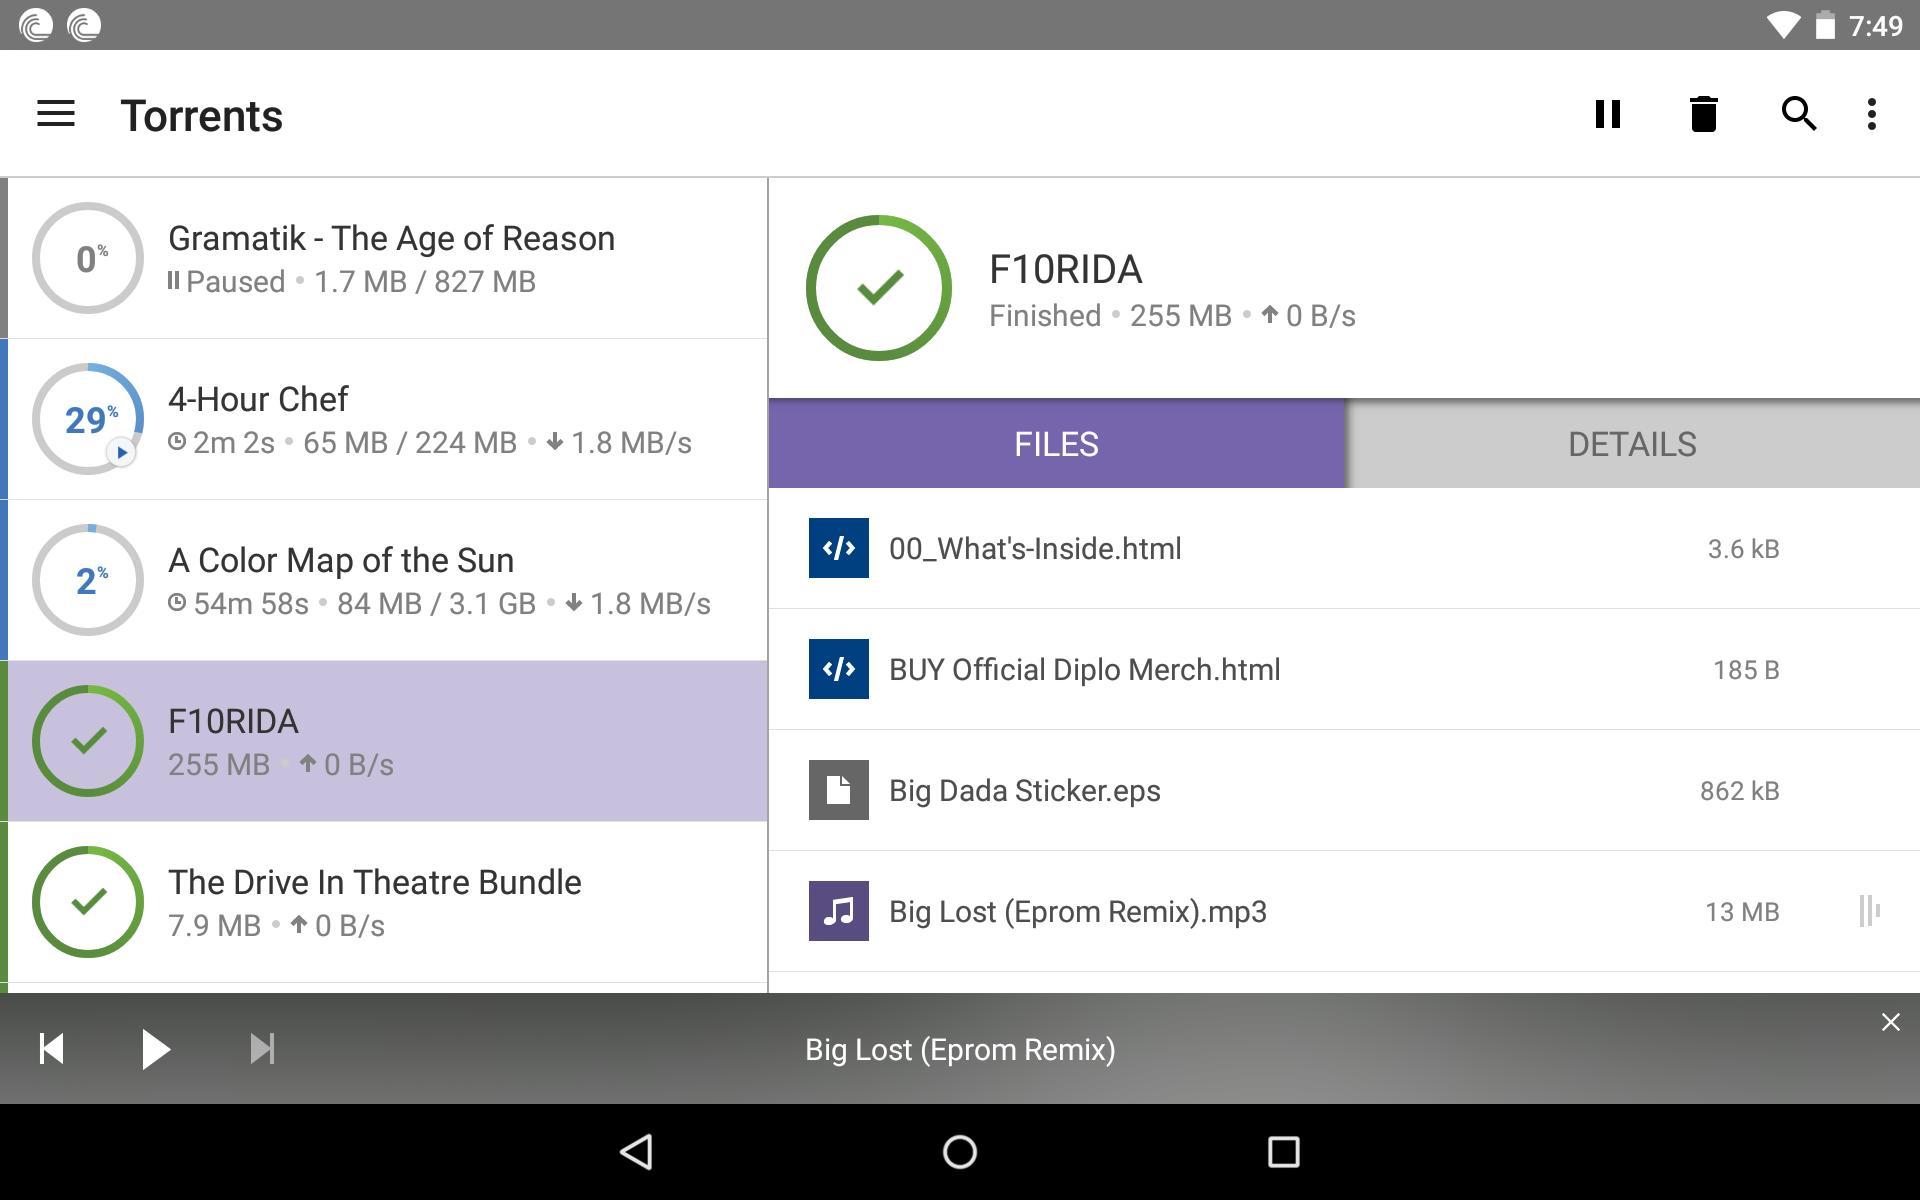 BitTorrent®- Torrent Downloads for Android - APK Download